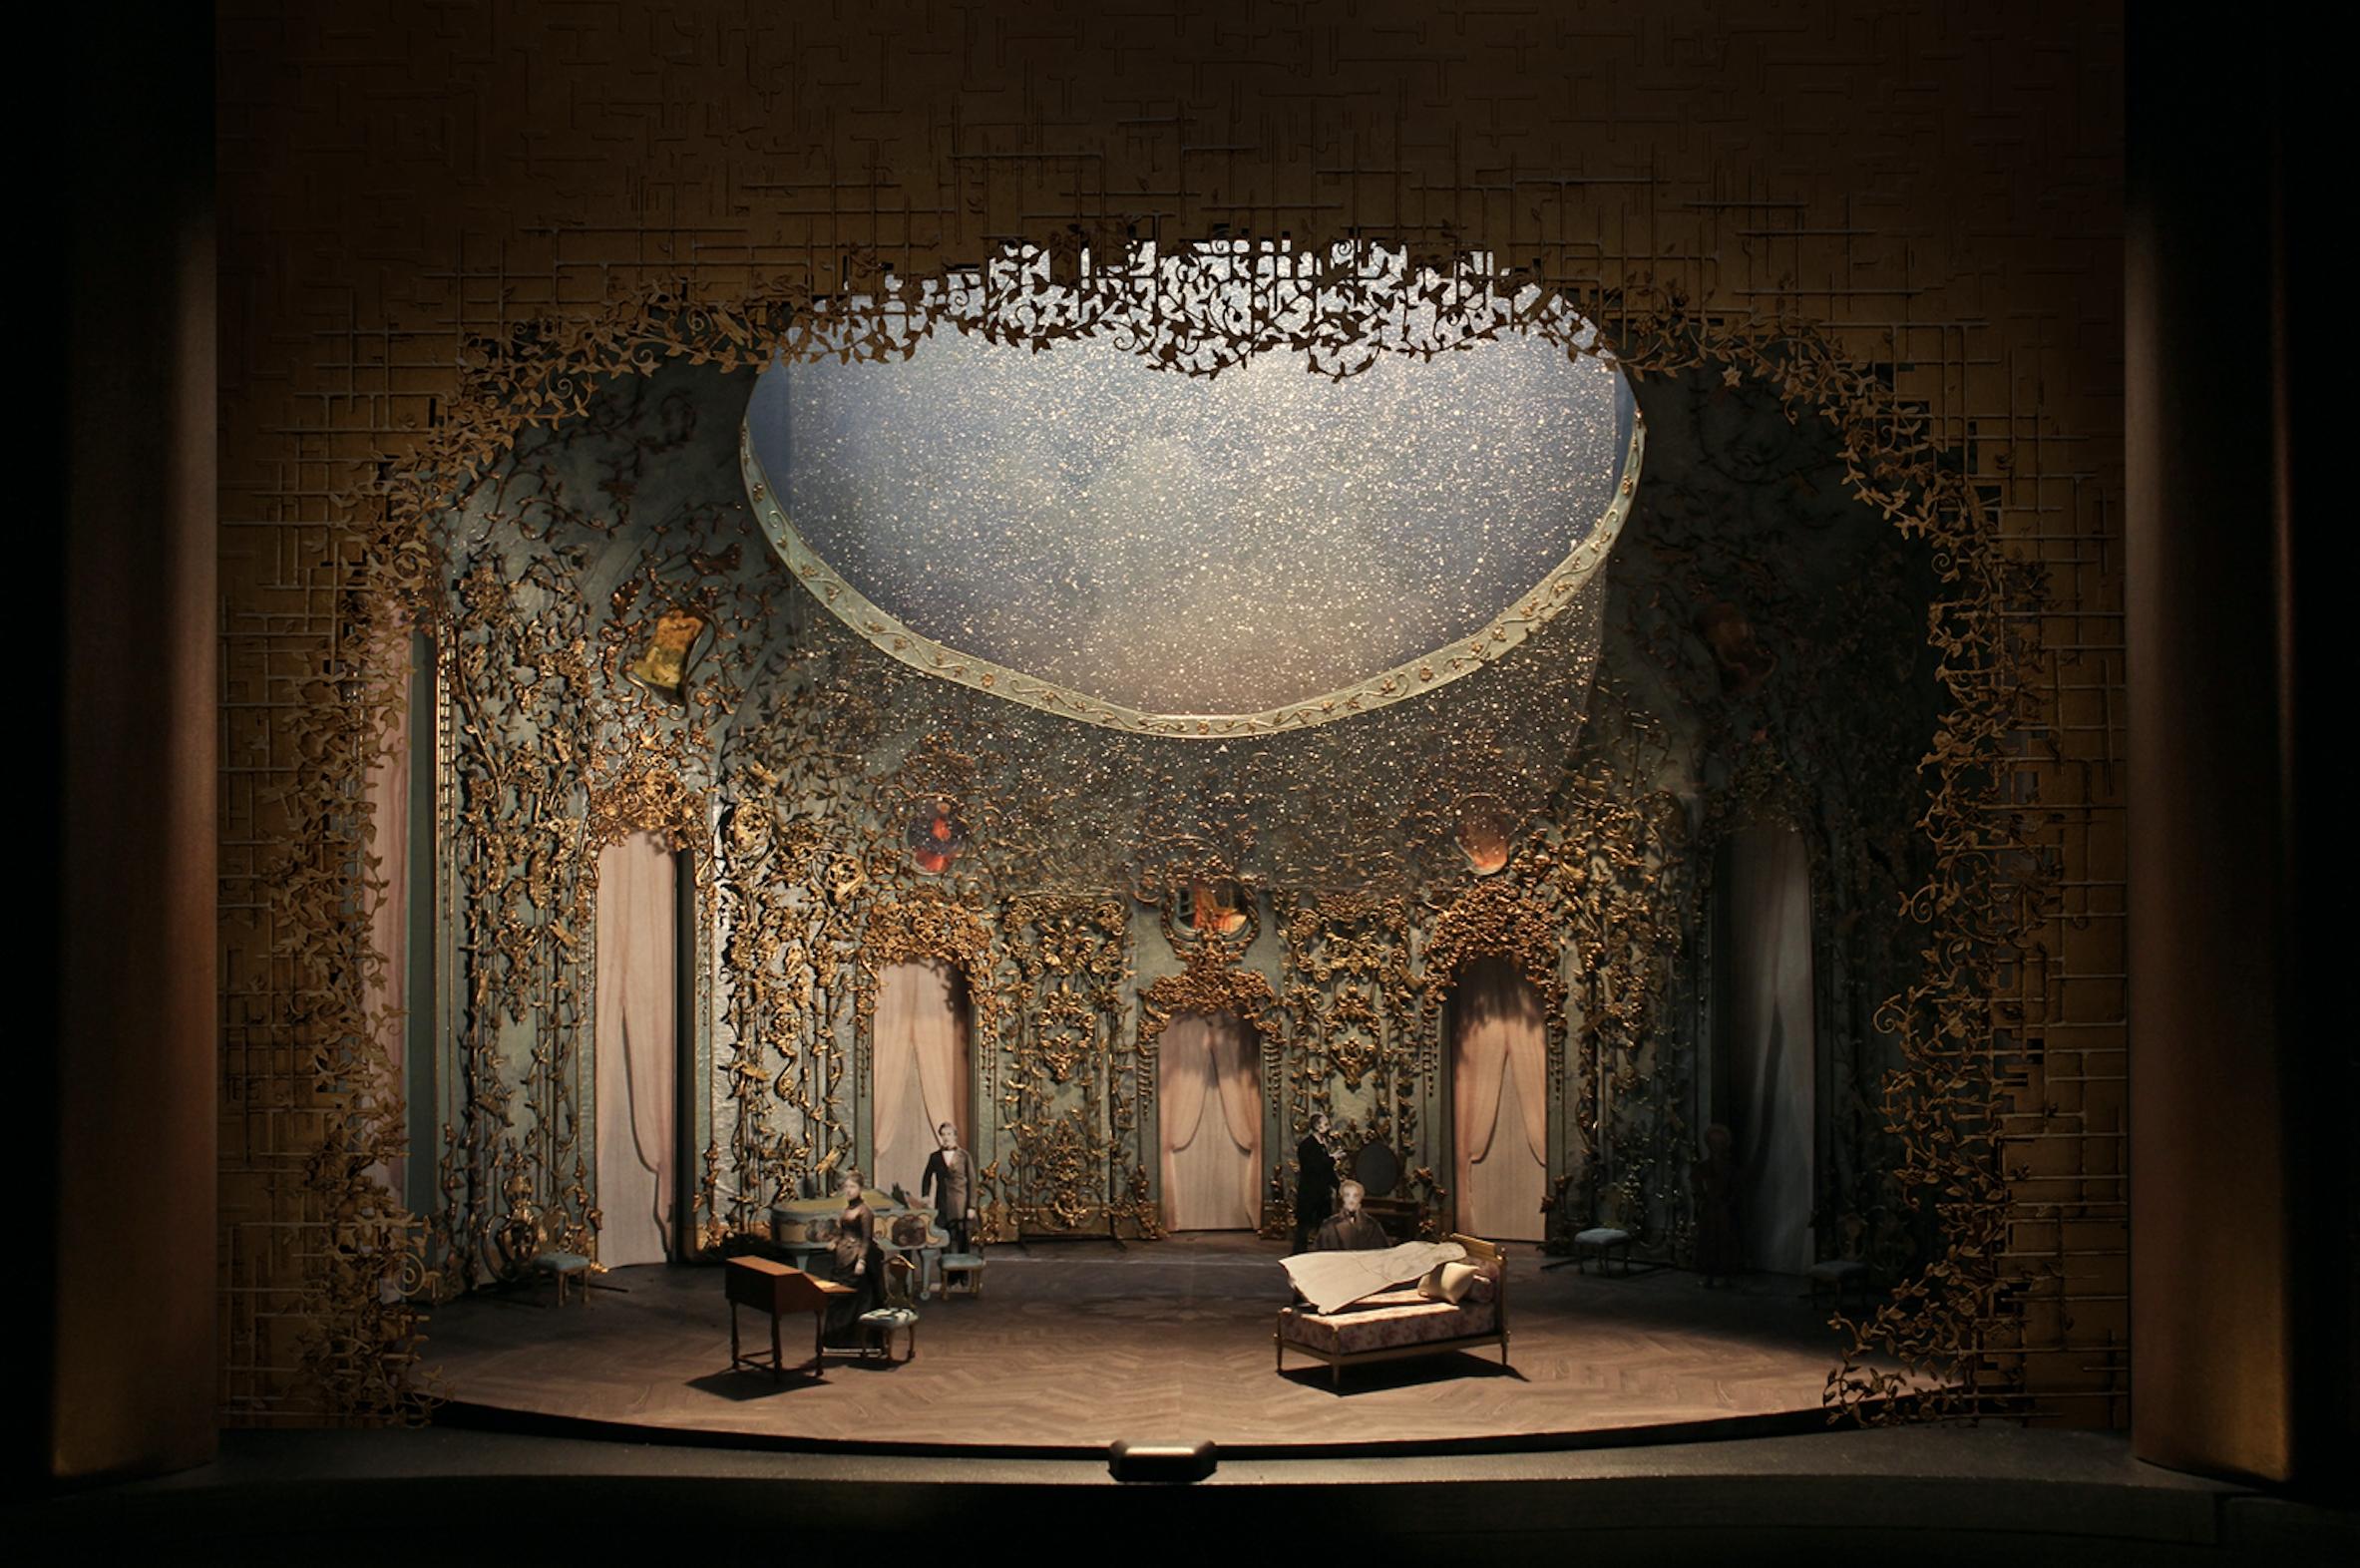 La Traviata - maquette des décors